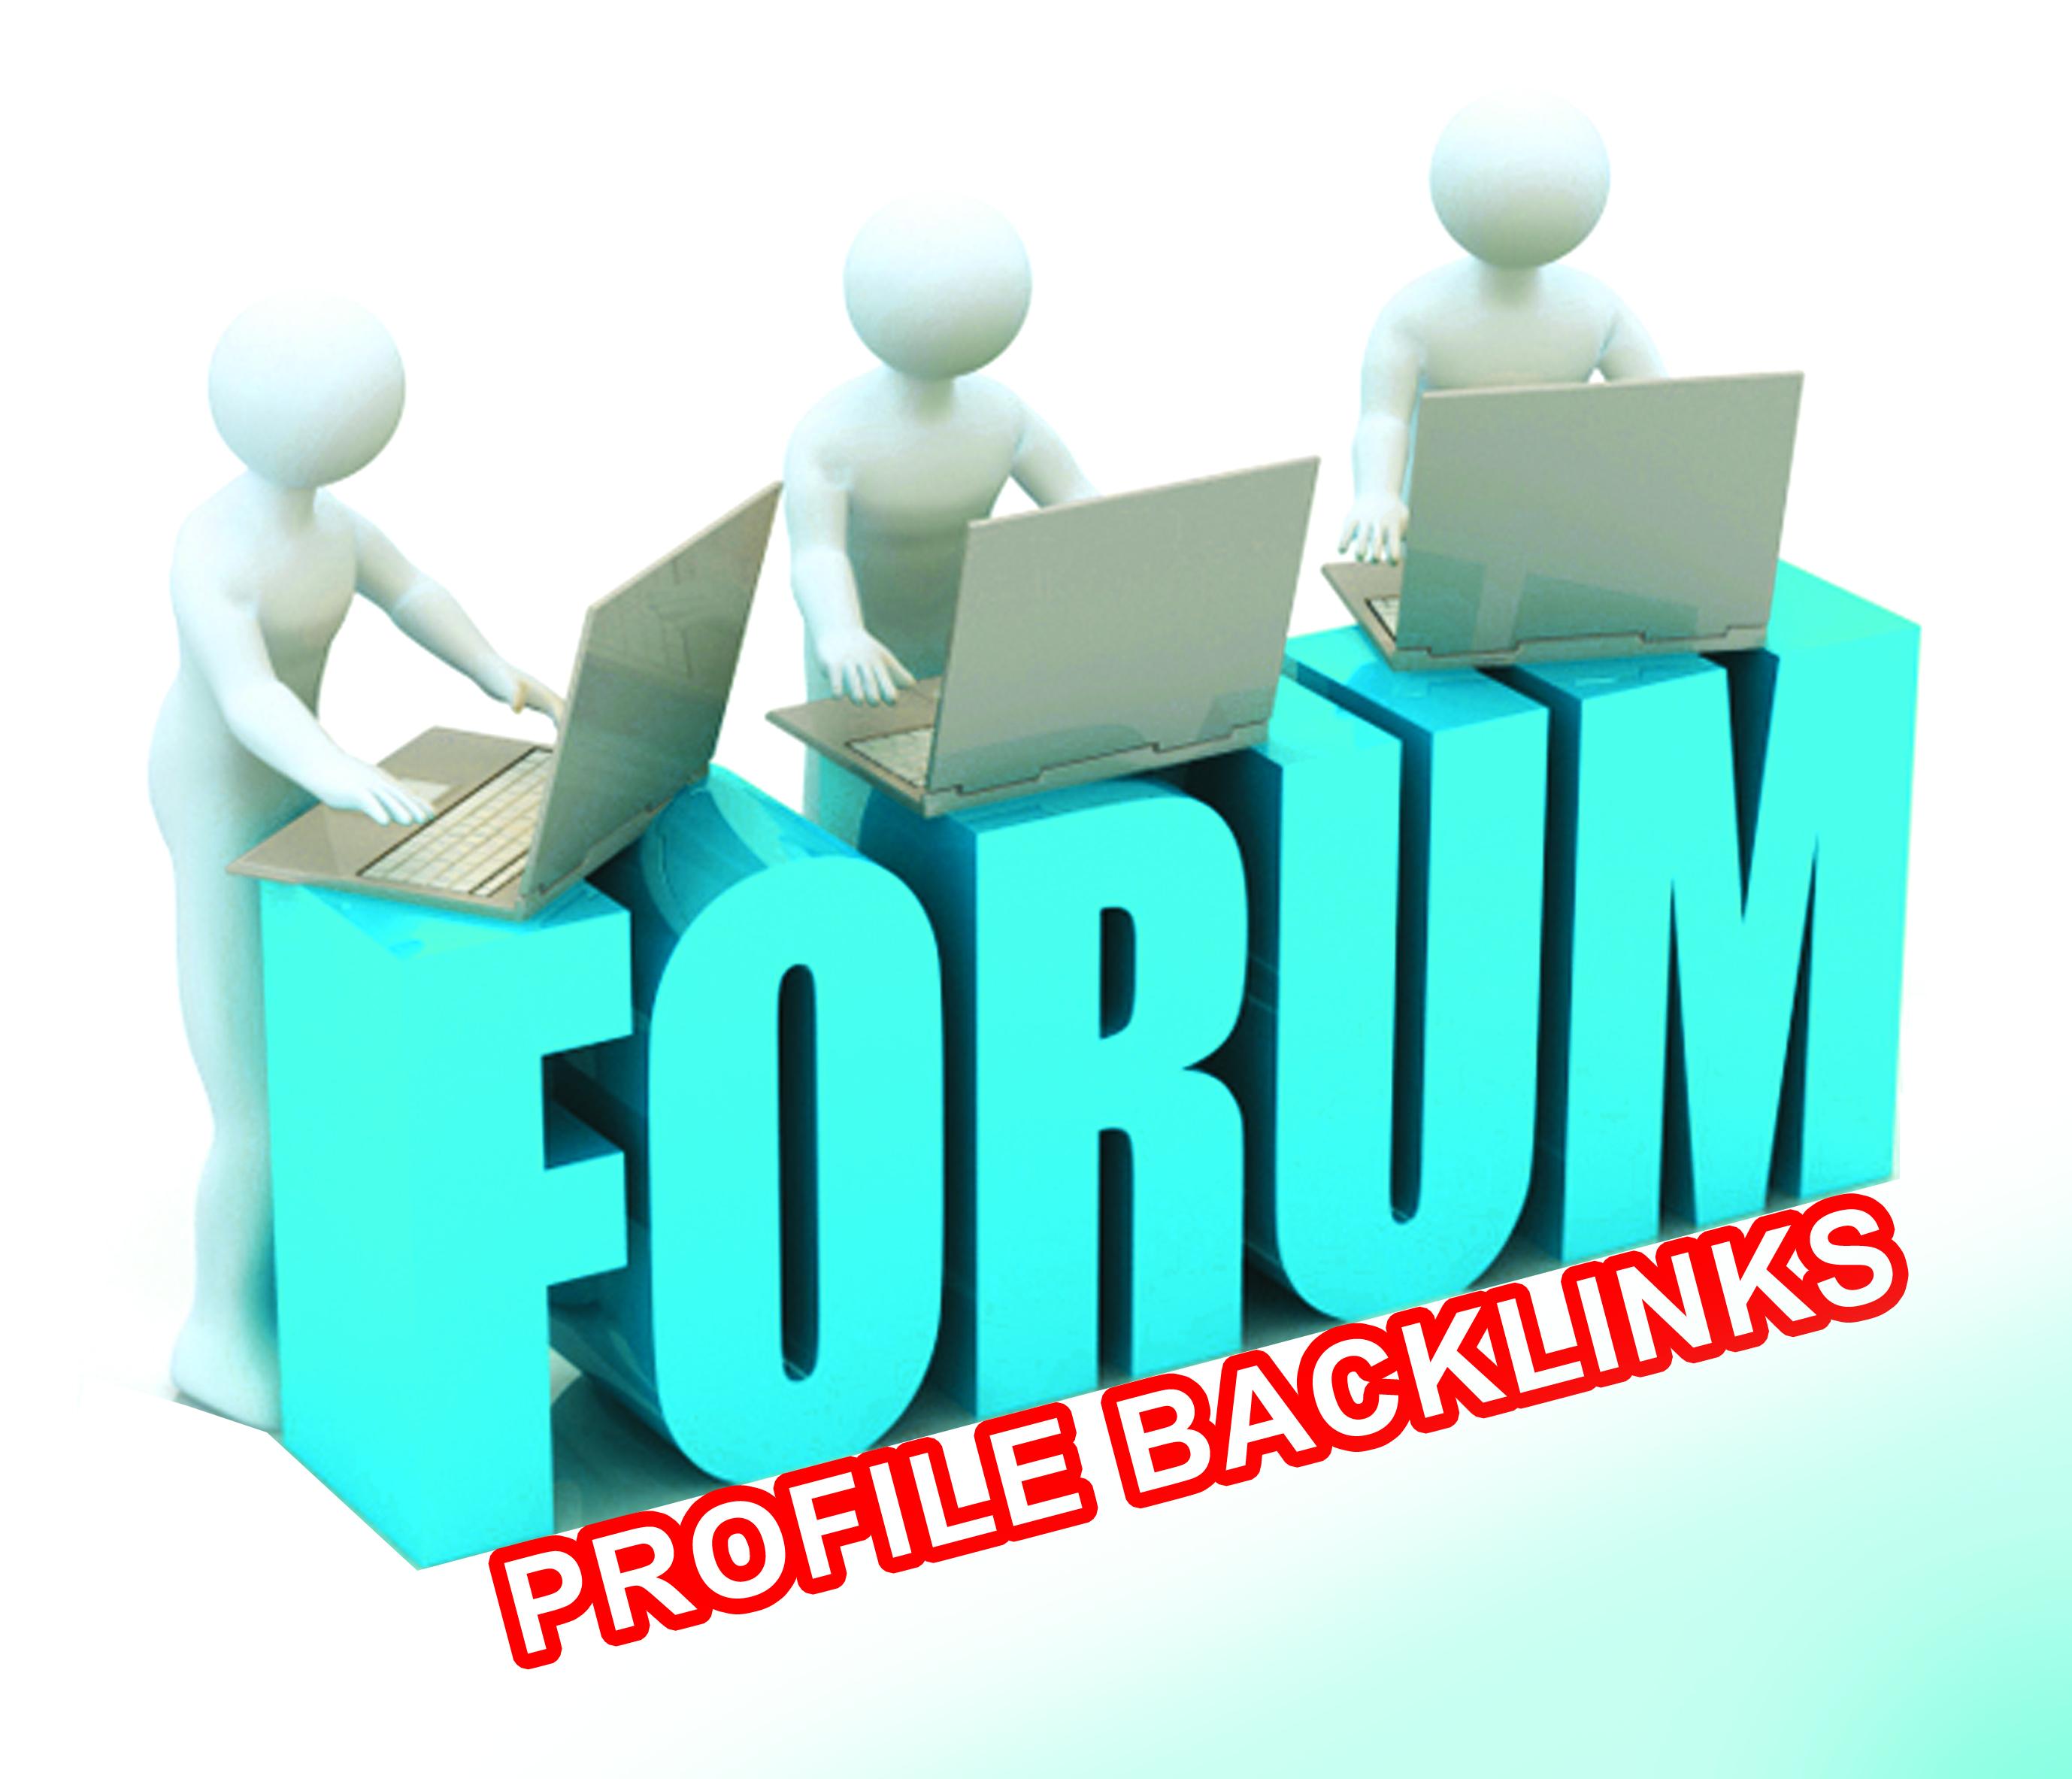 Create 111+ High Quality Forum Profile Backlinks